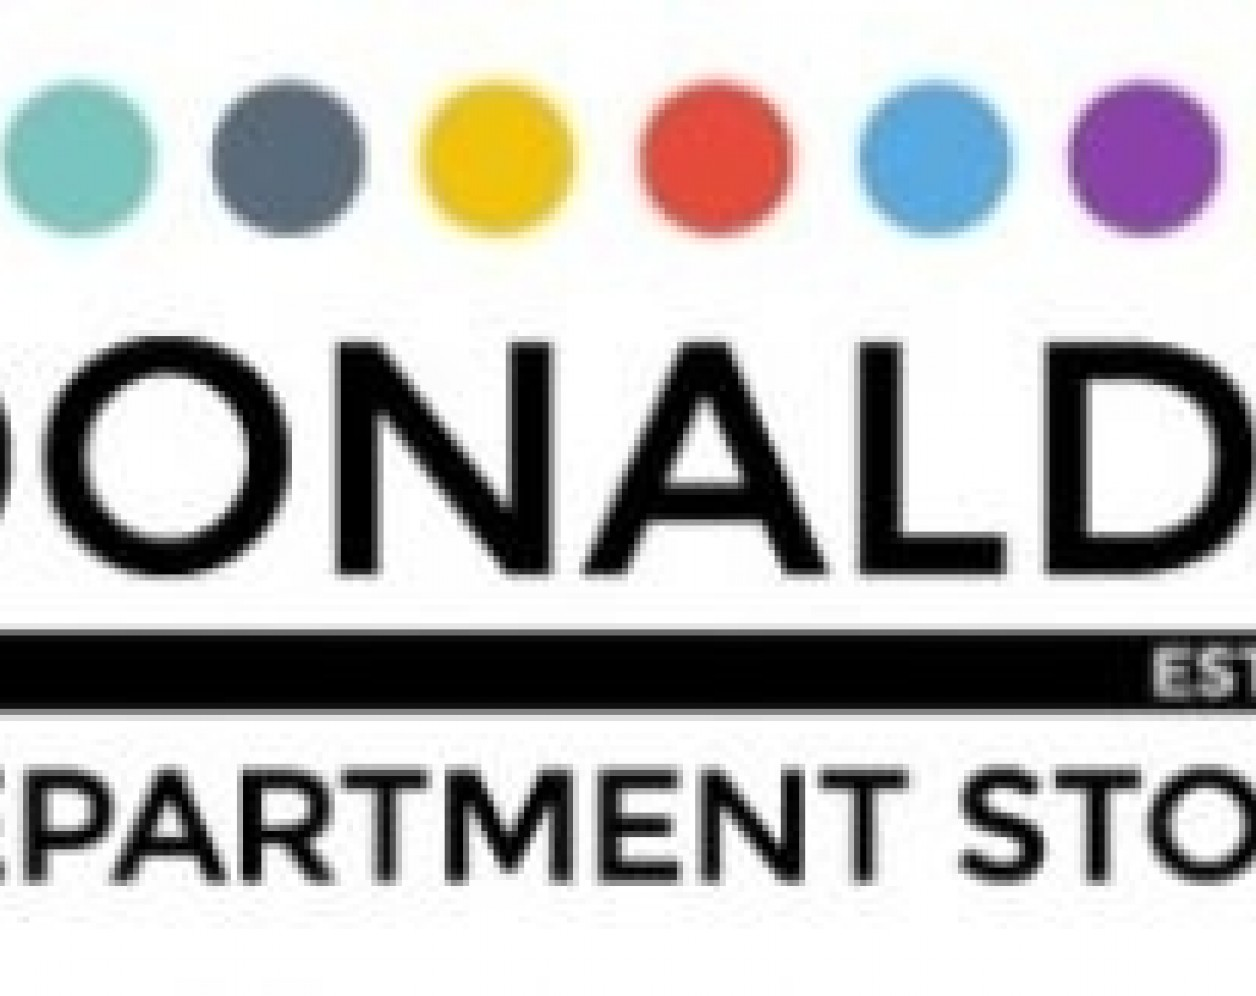 Donald's Department Store